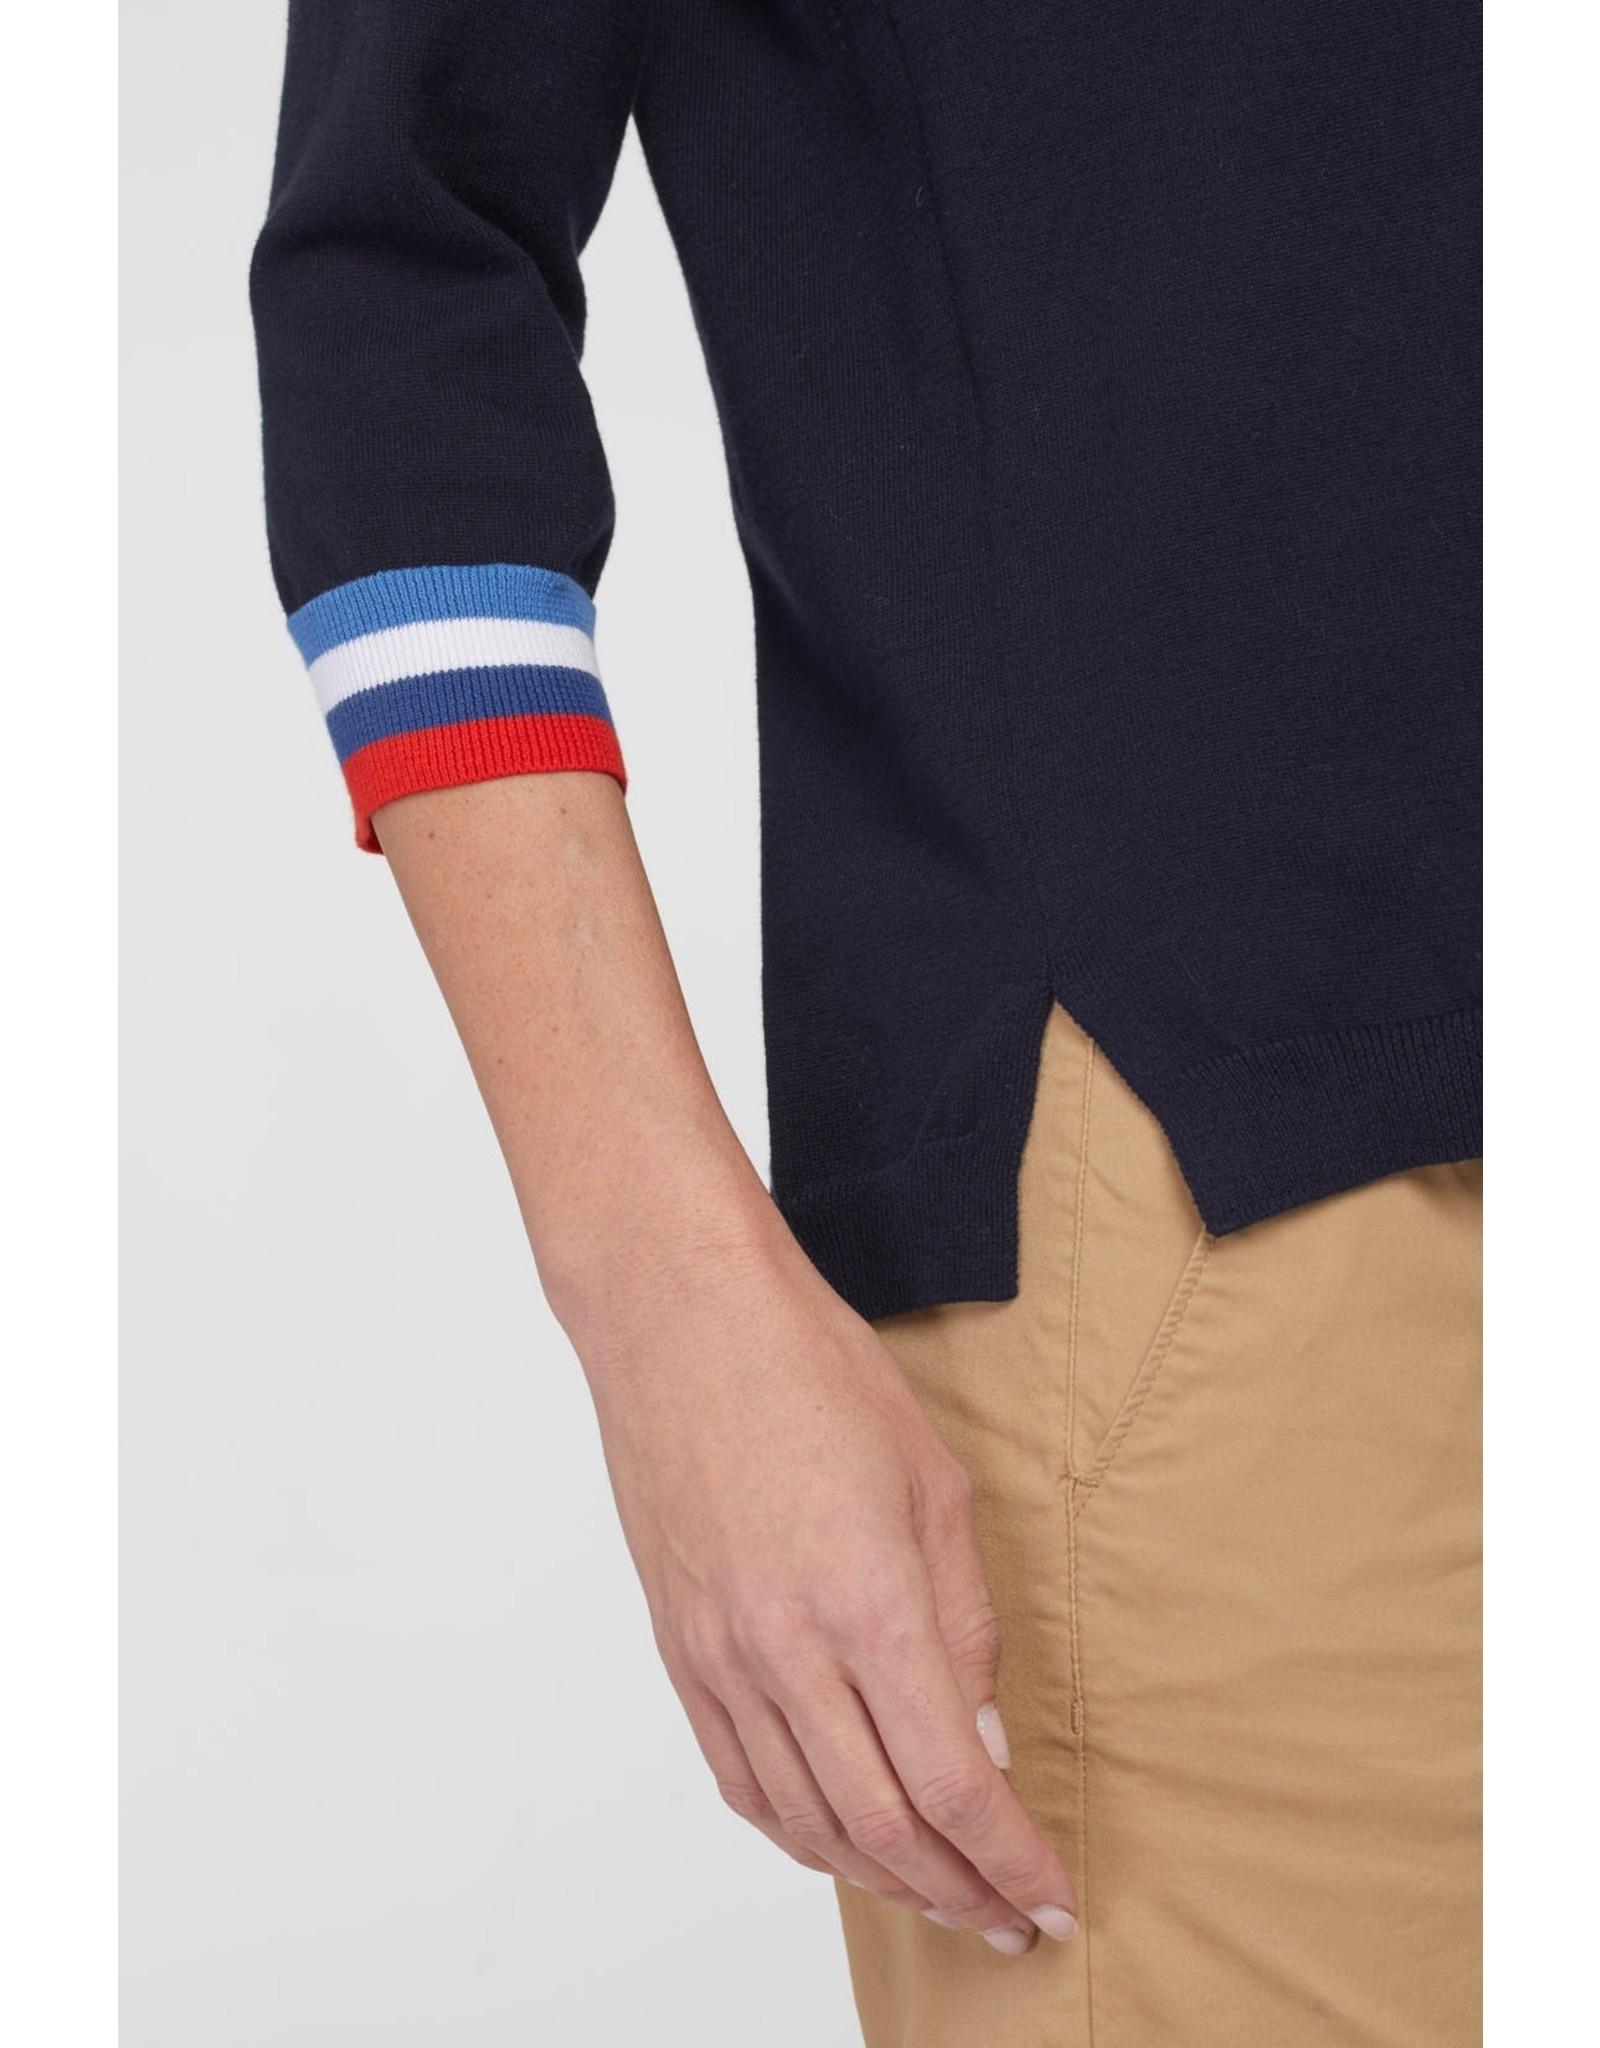 Tribal Sea Salt Sun Sweater 45520 (S1)